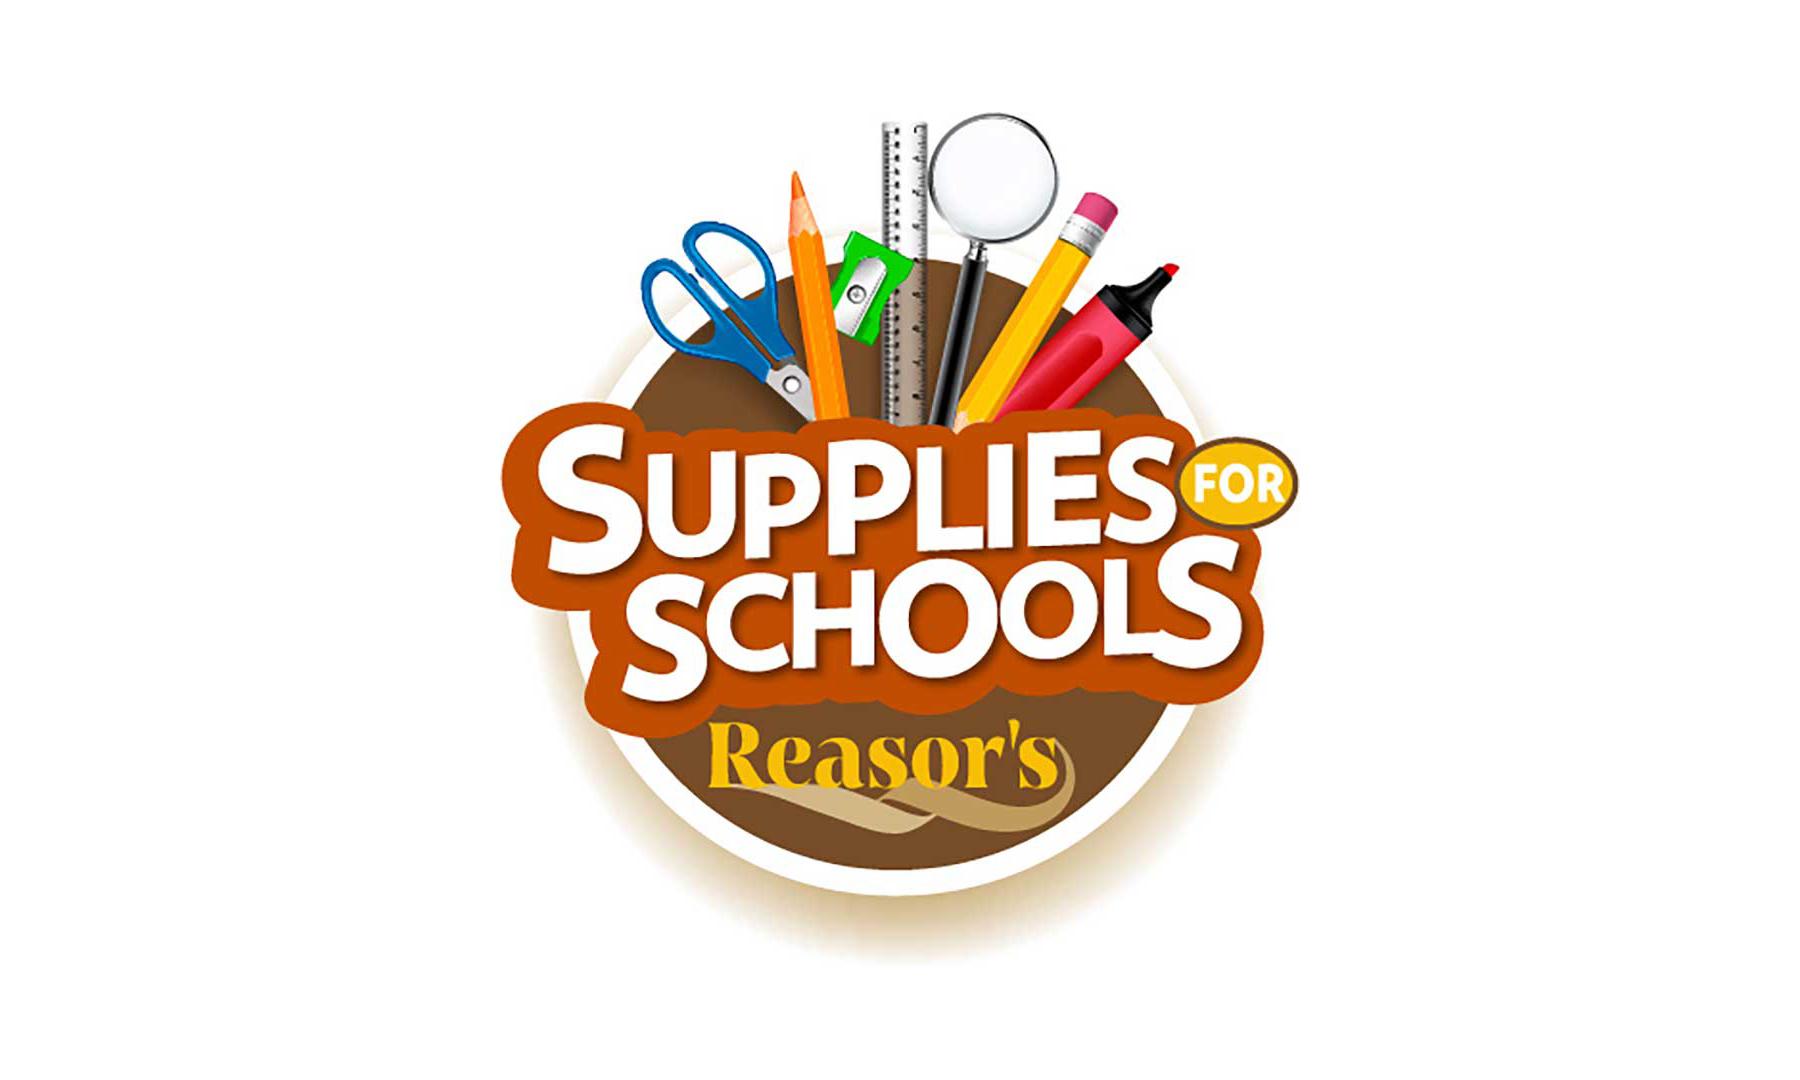 Reasor's Supplies for Schools logo